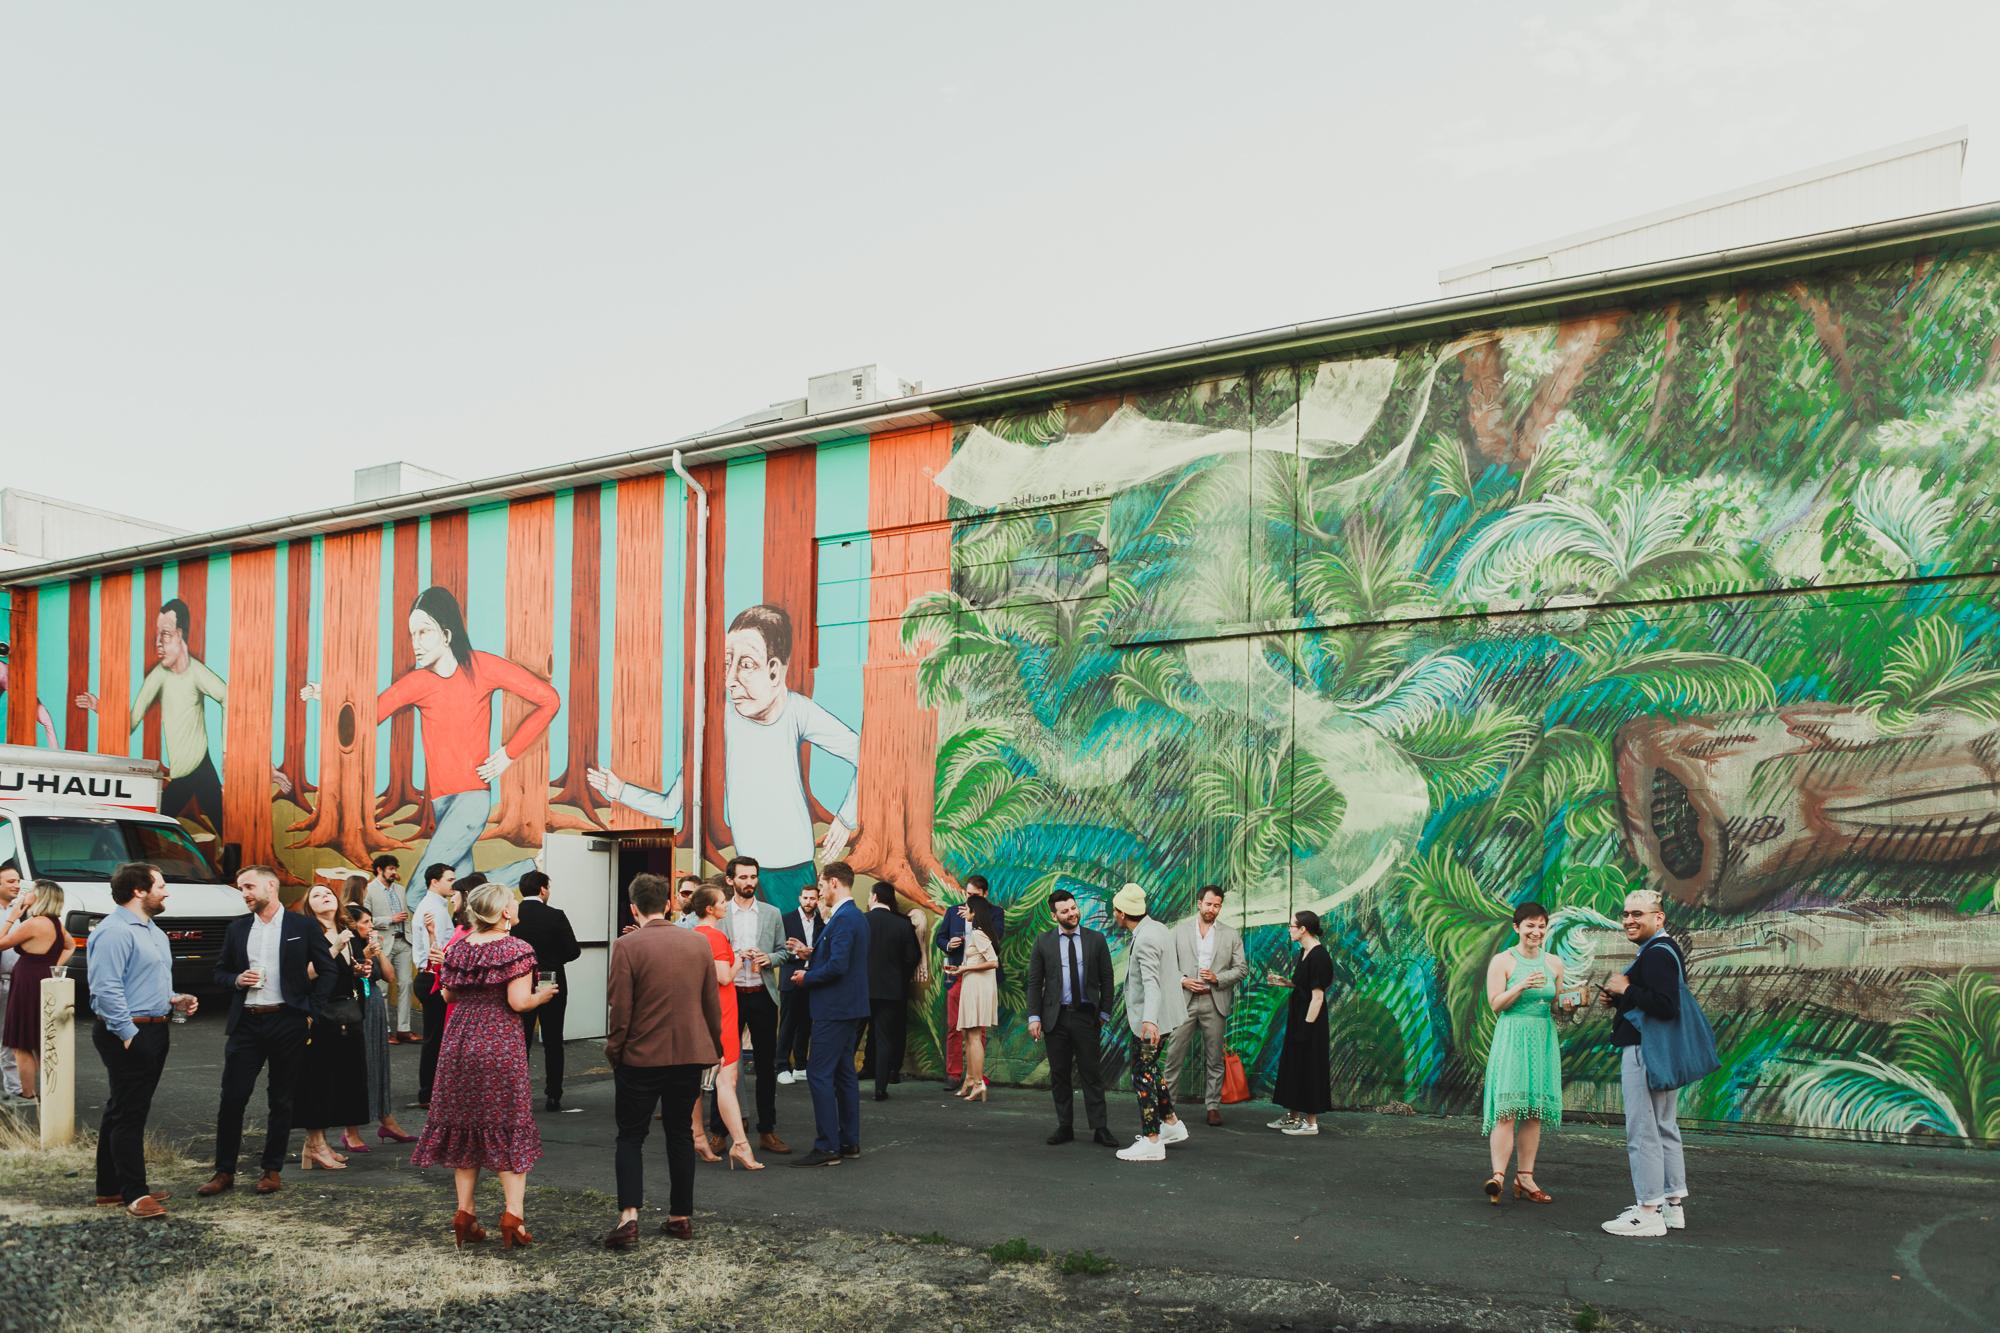 canvas event space wedding photos by Krista Welch-0119.jpg